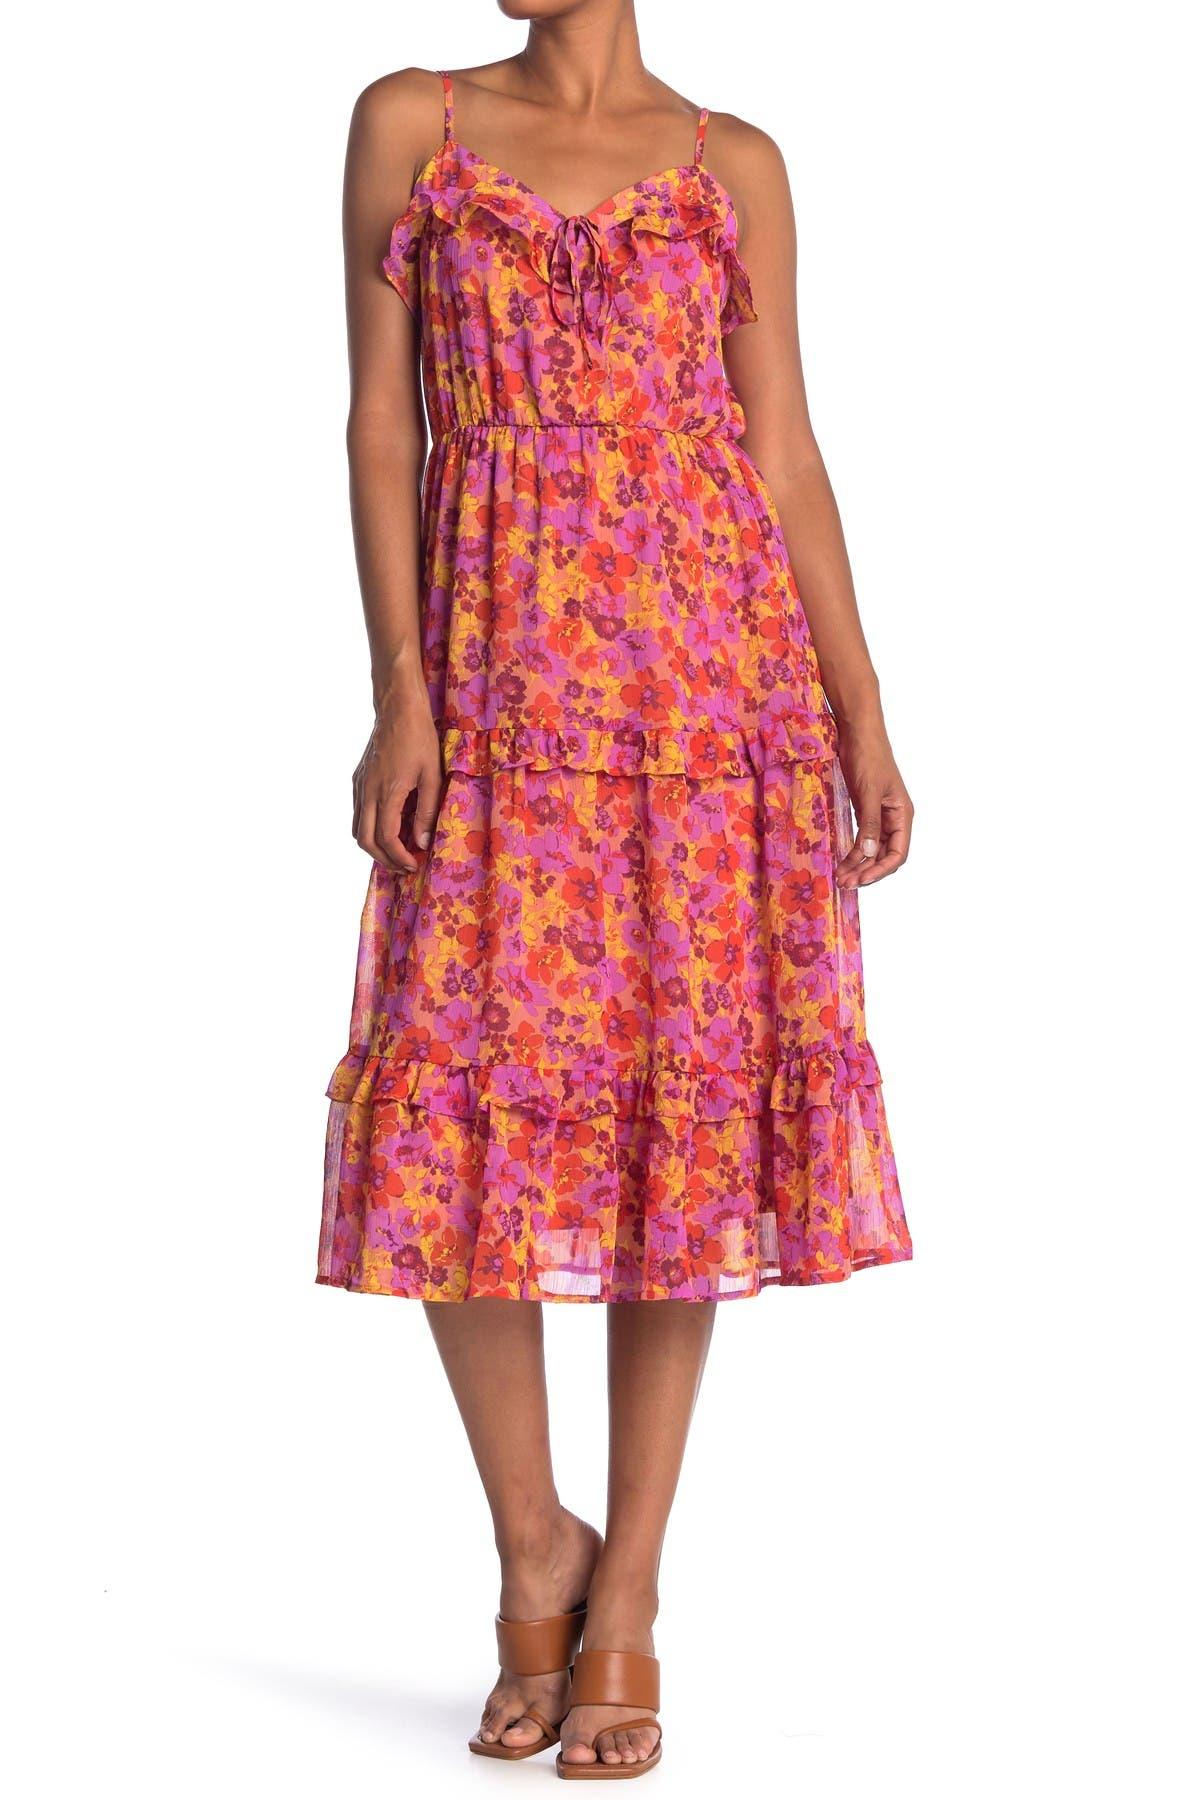 Image of Lush Floral Print Tiered Ruffle Midi Dress